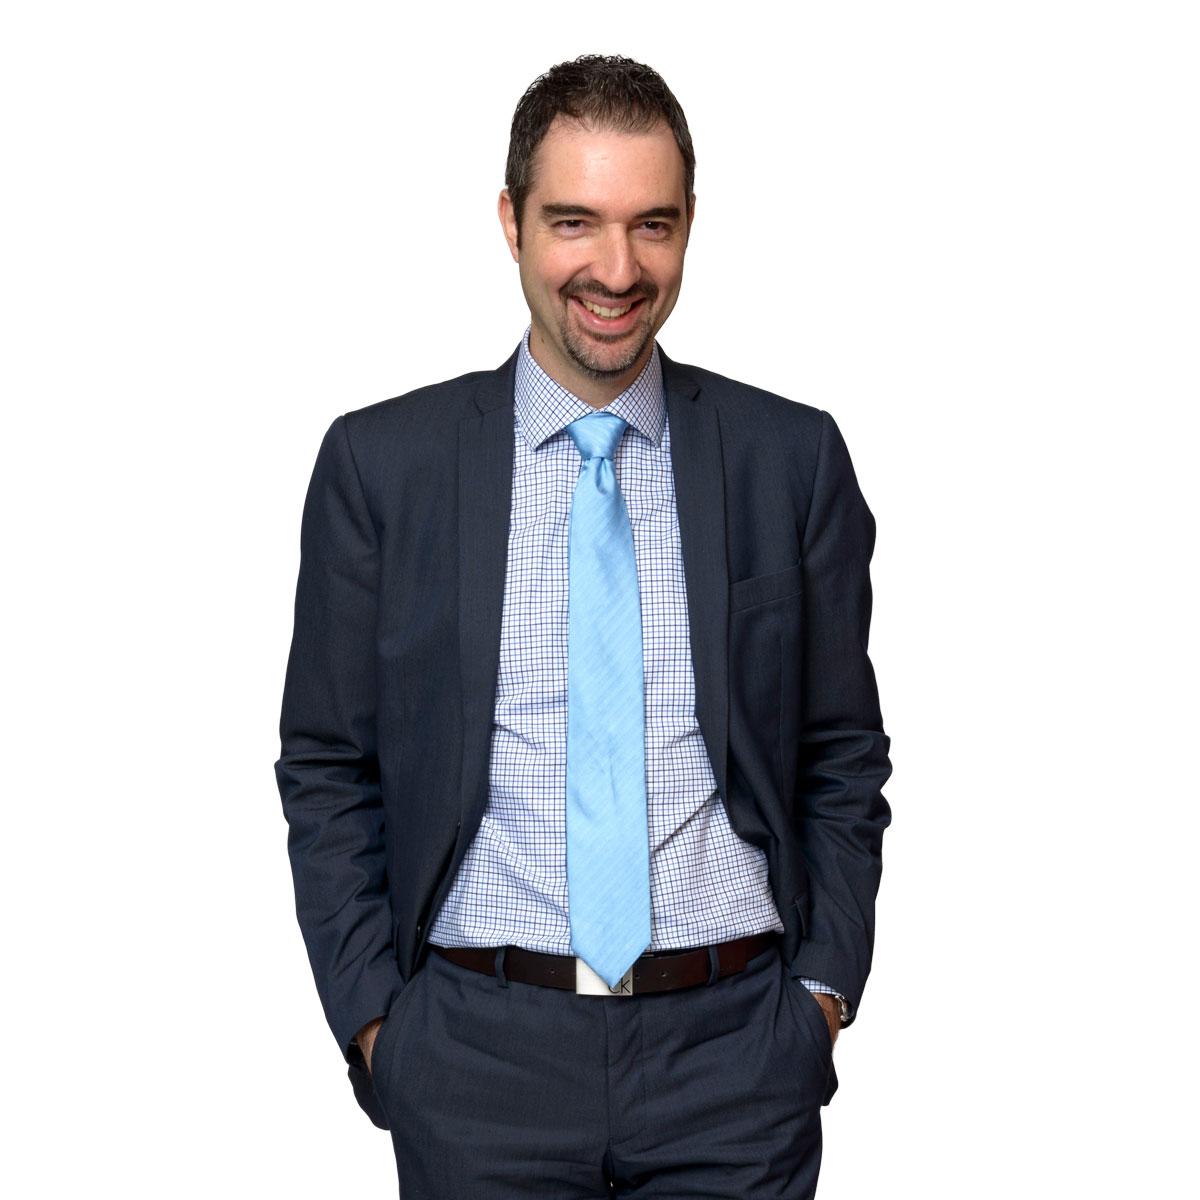 Jean-François Dister